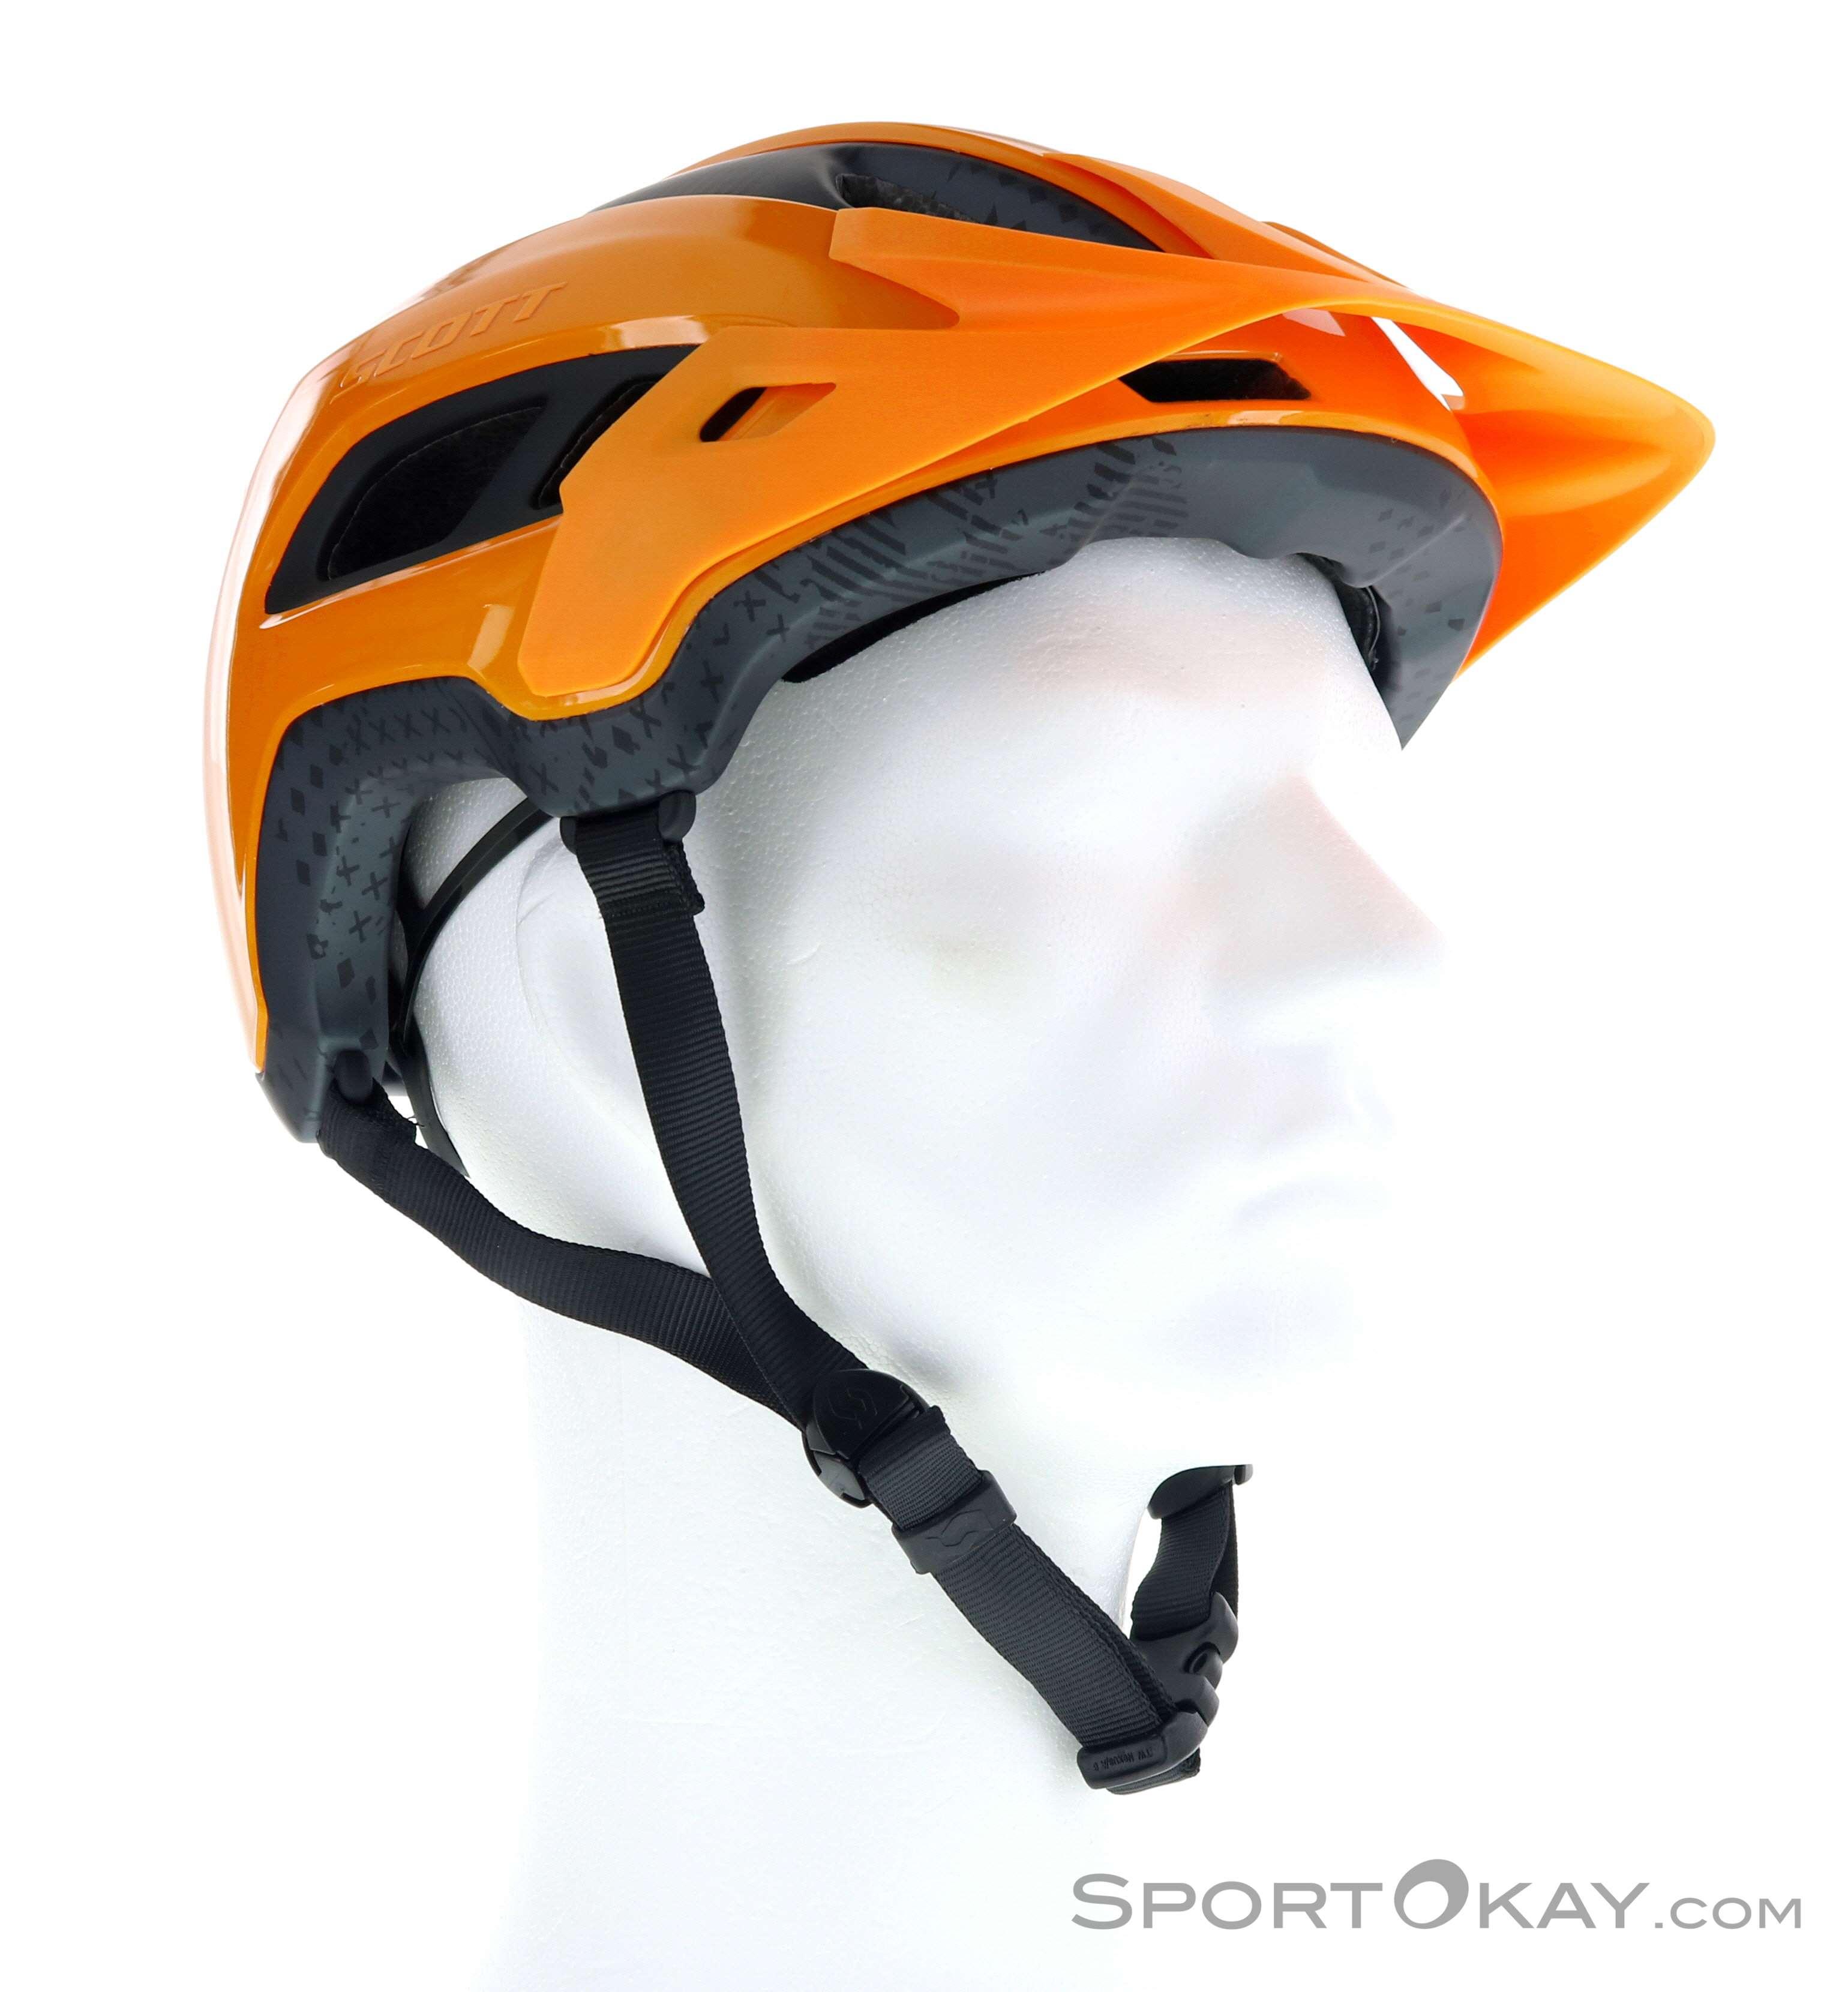 Scott Scott Stego MIPS Biking Helmet